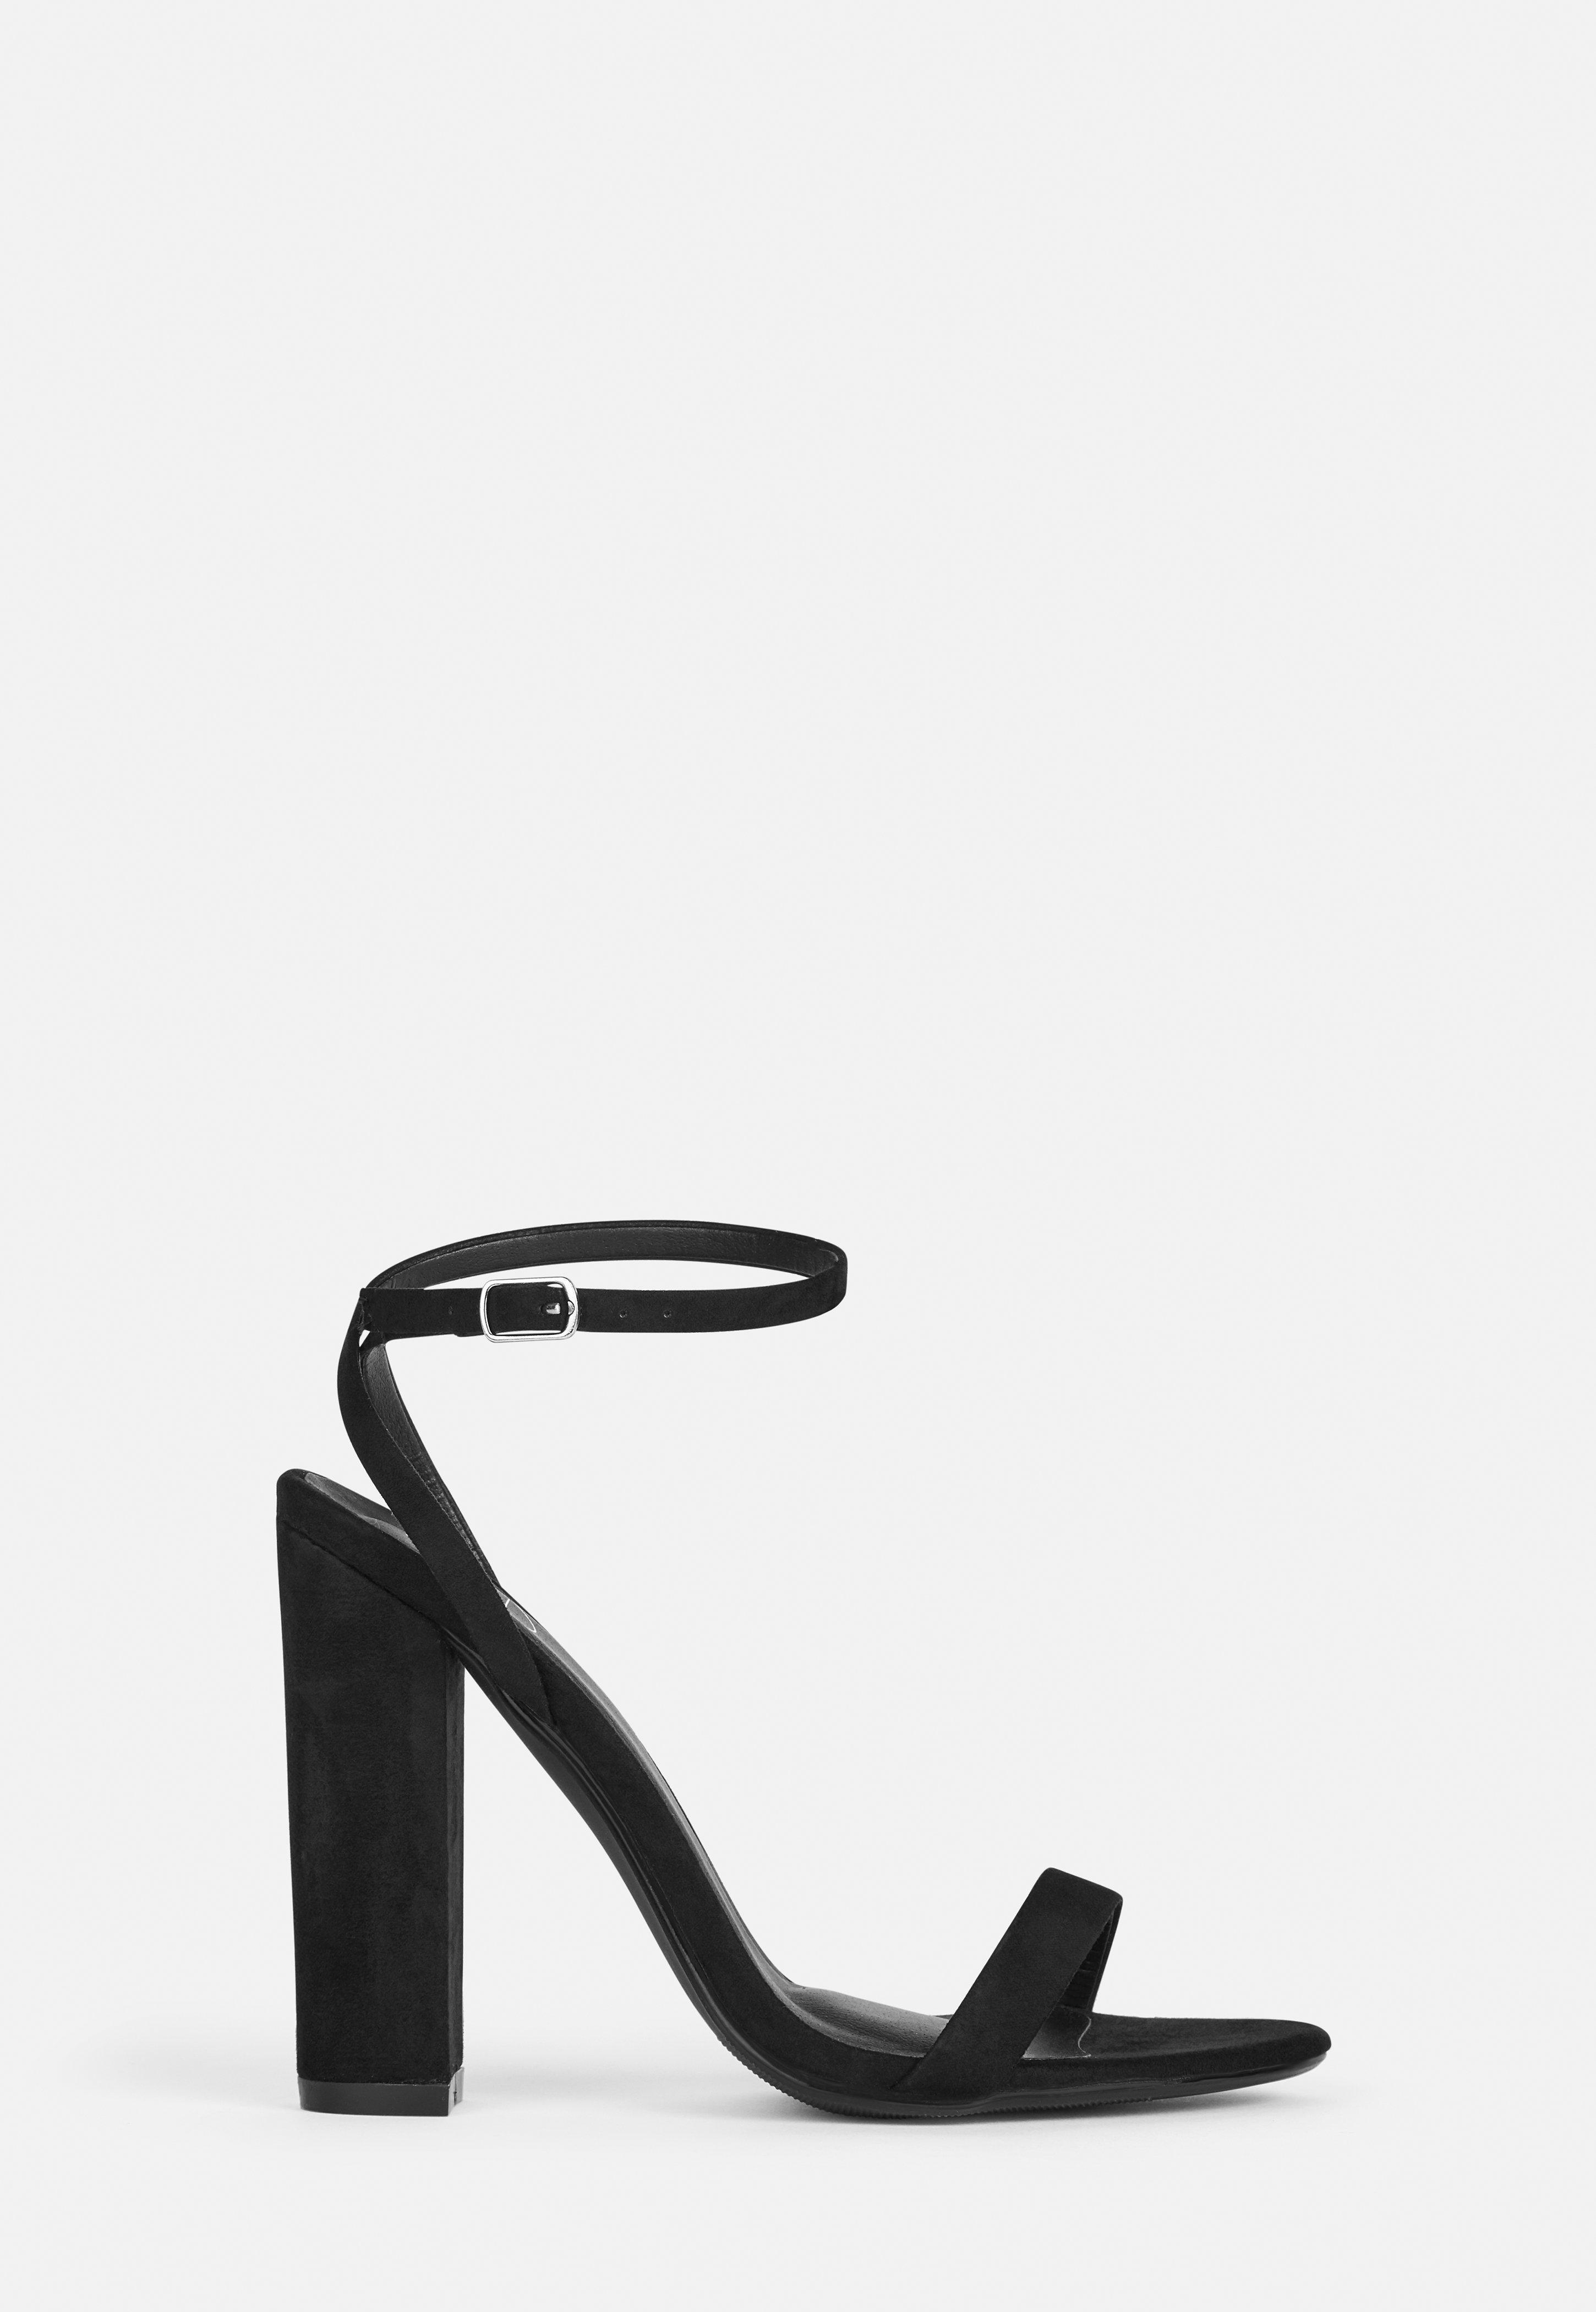 84a038a0f09e07 Schuhe mit Blockabsatz online kaufen - Missguided DE